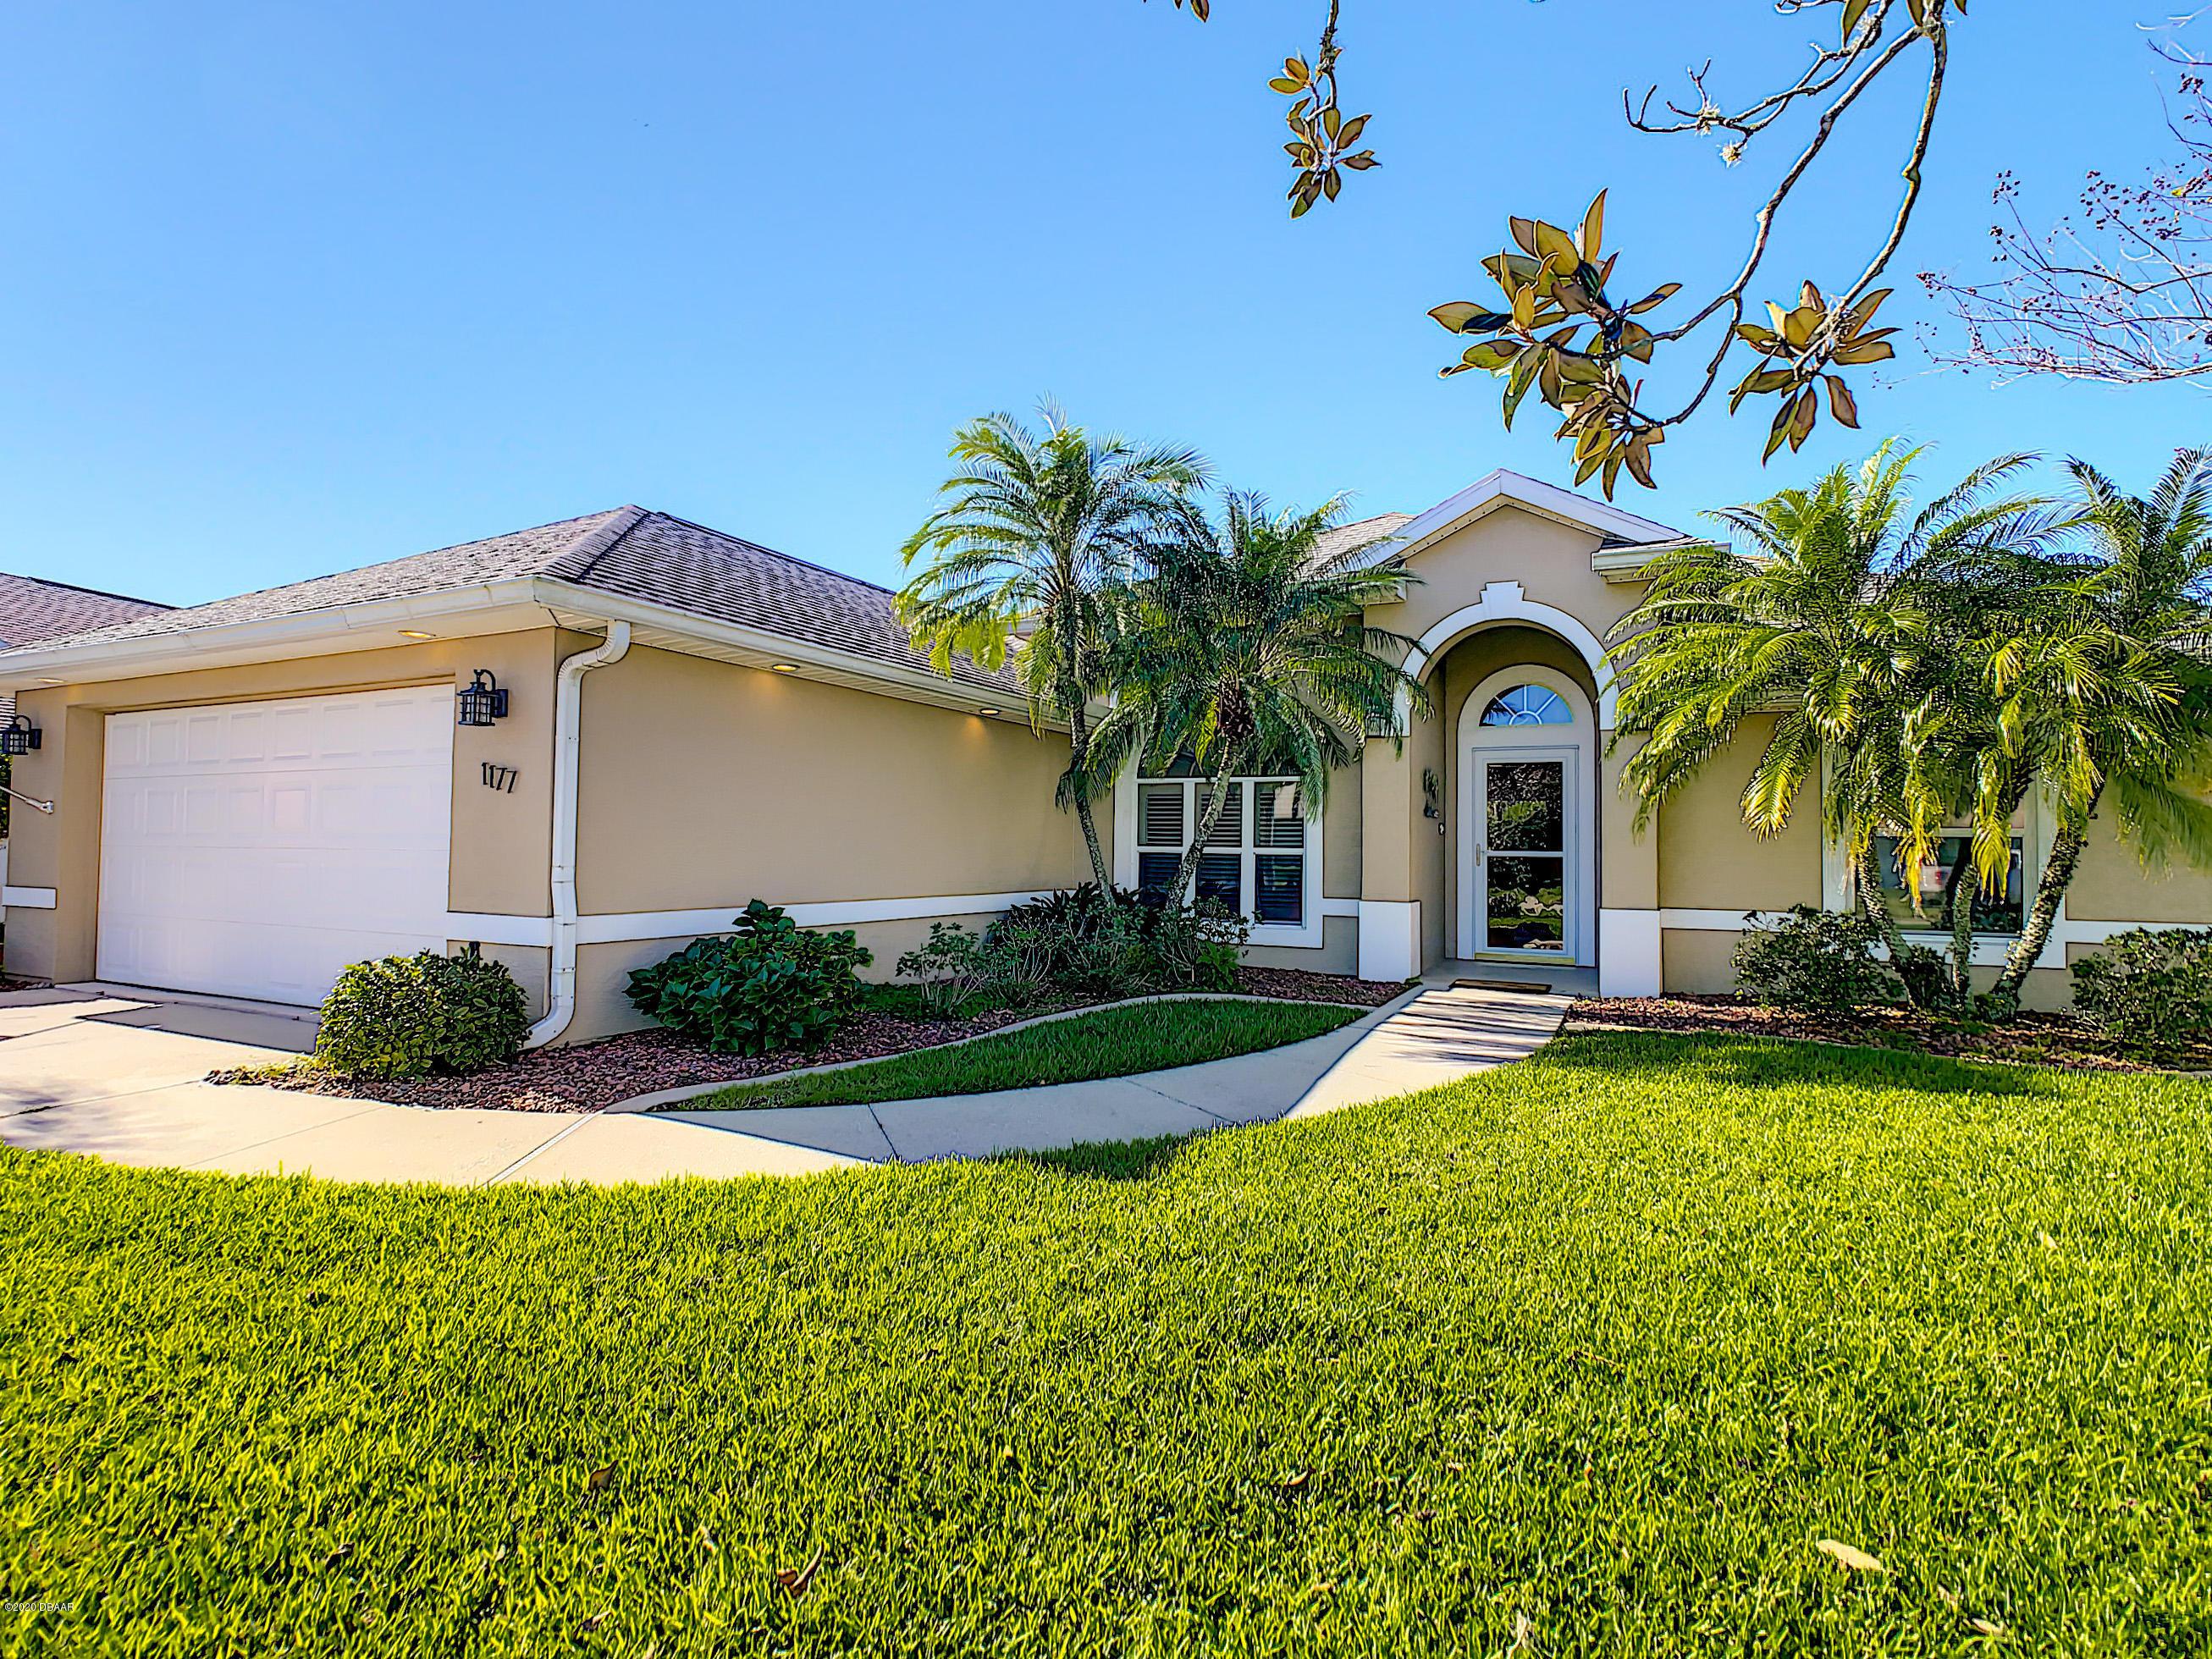 Photo of 1177 Sable Key Circle, Port Orange, FL 32128